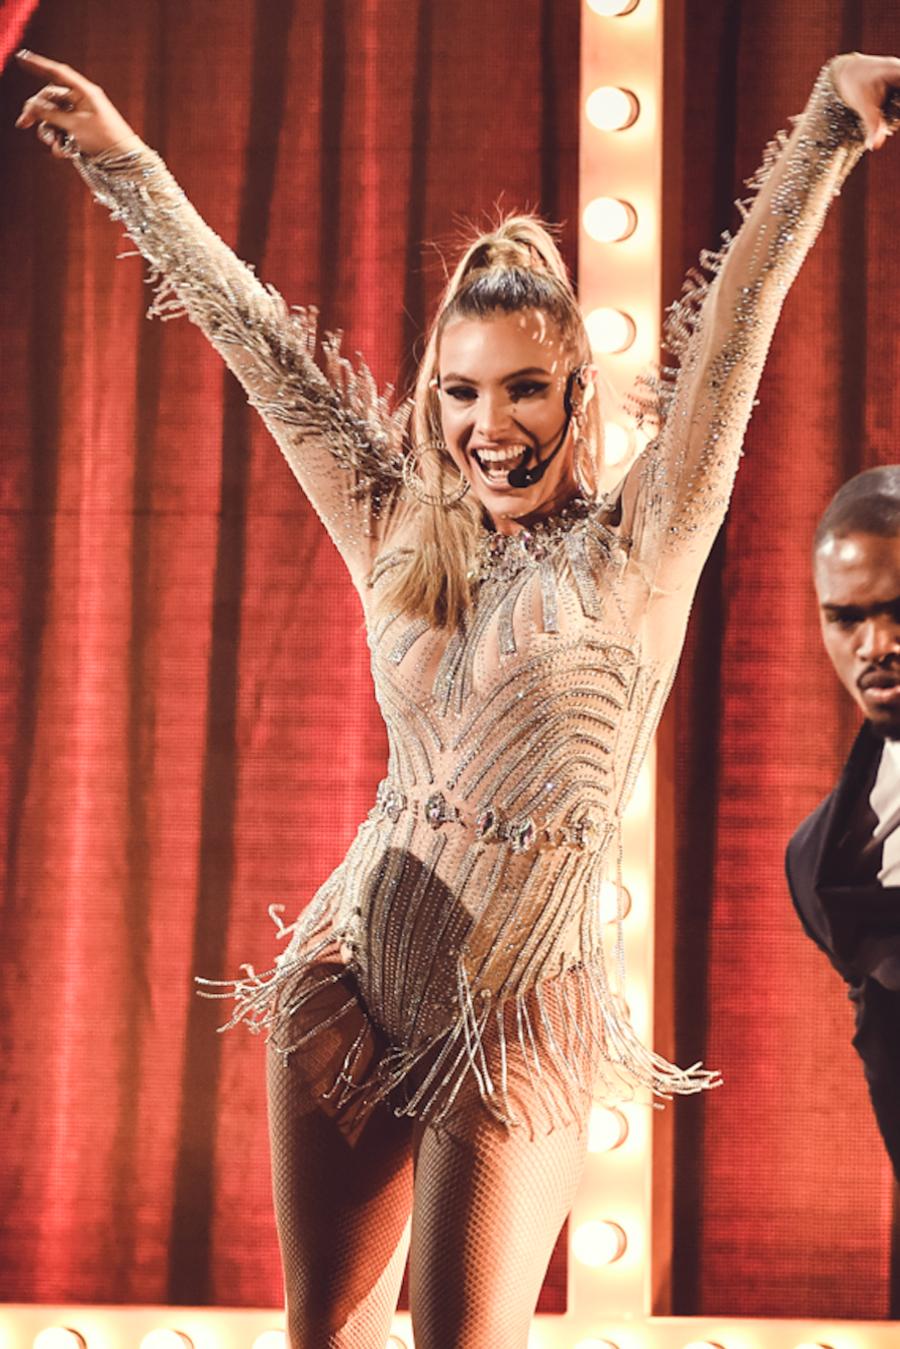 Lele Pons canta 'Celoso' en los Latin AMAs 2018